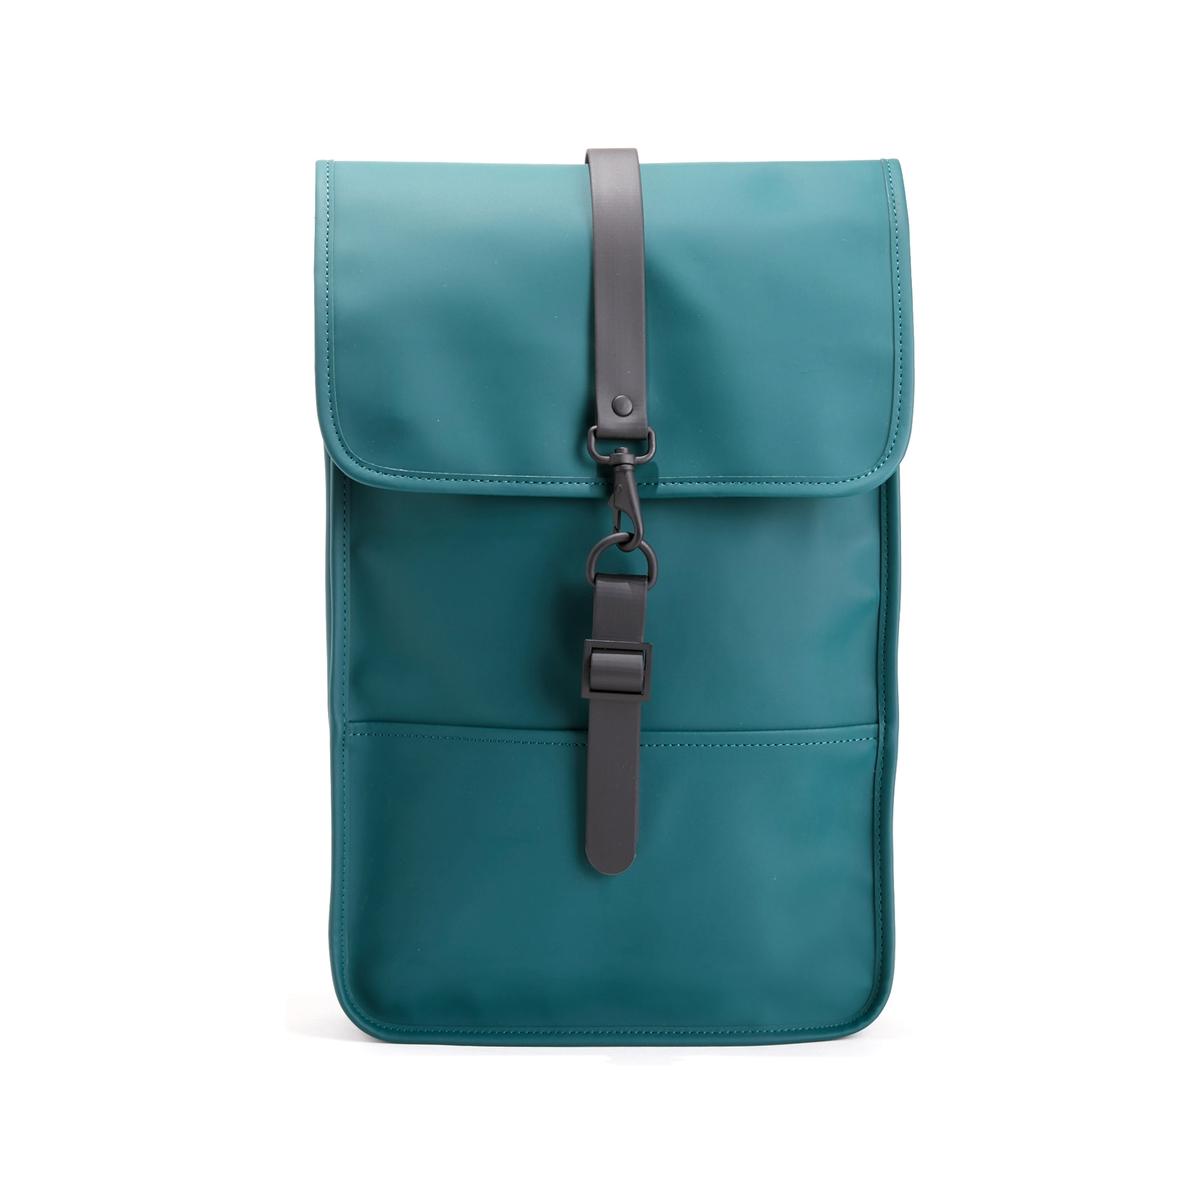 Рюкзак непромокаемый BACKPACK MINI DARK TEAL